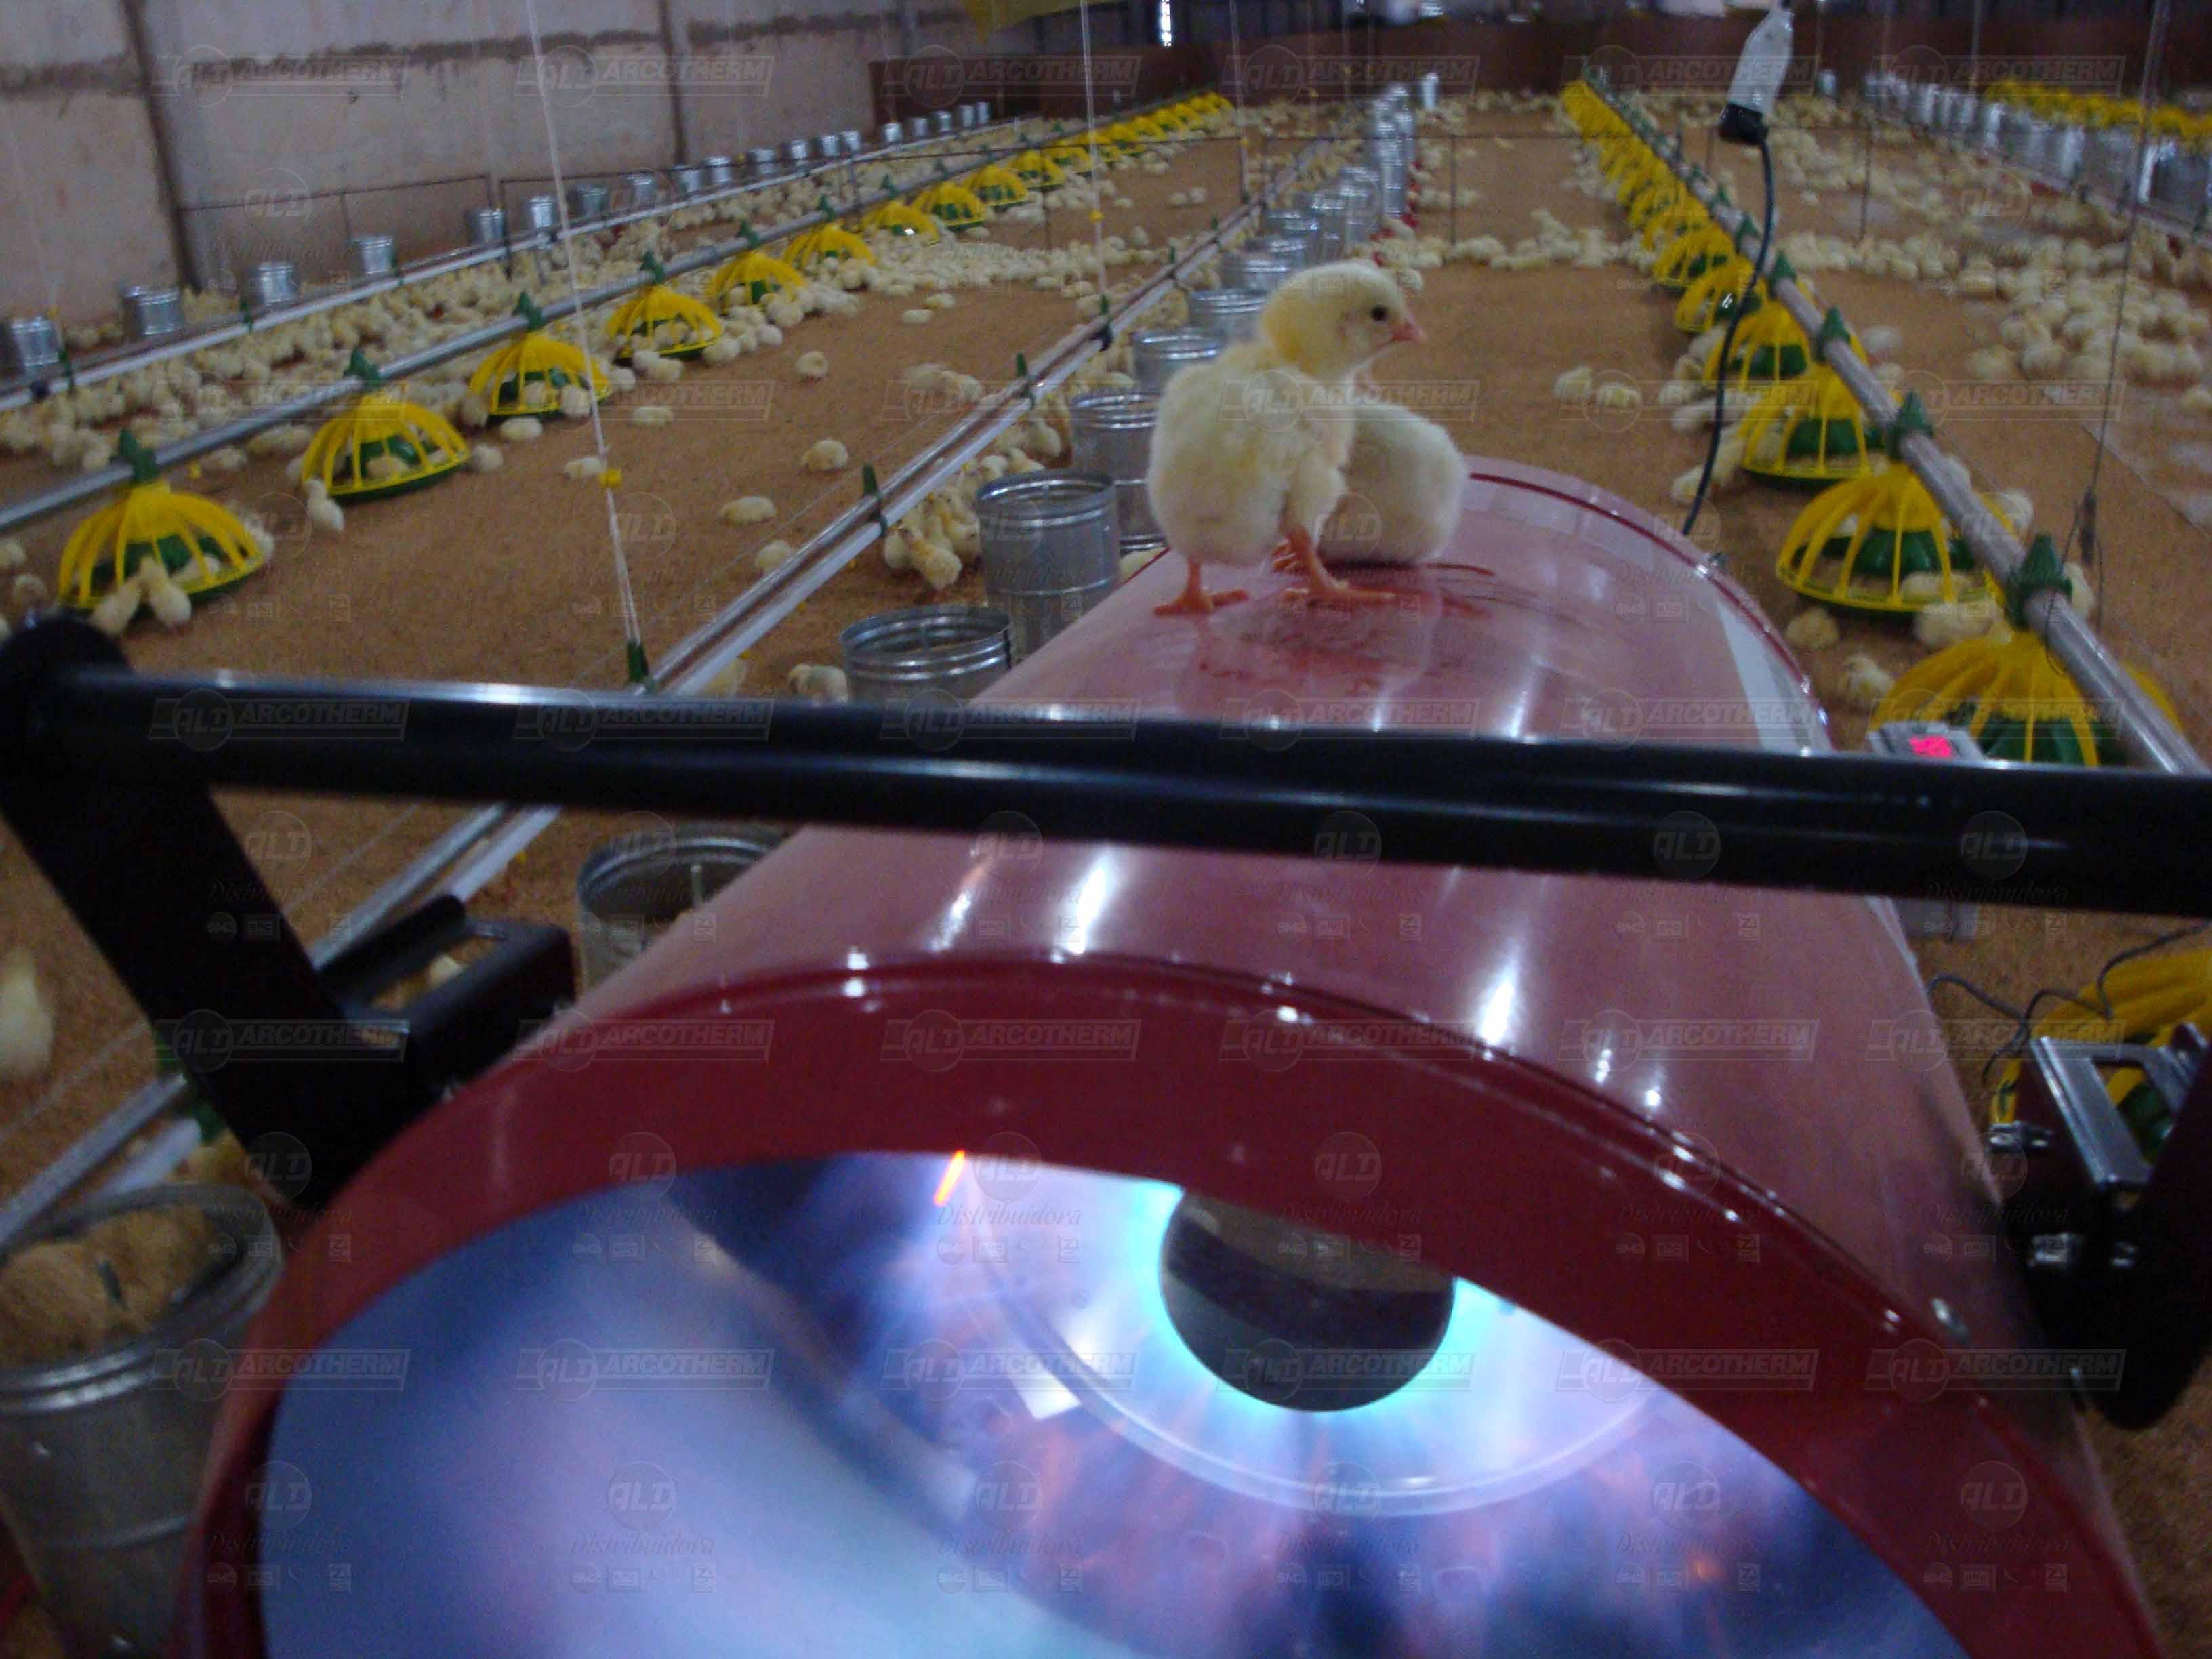 Granja - galpao frango de corte - aquecedor - gerador de ar quente - arcotherm- 7